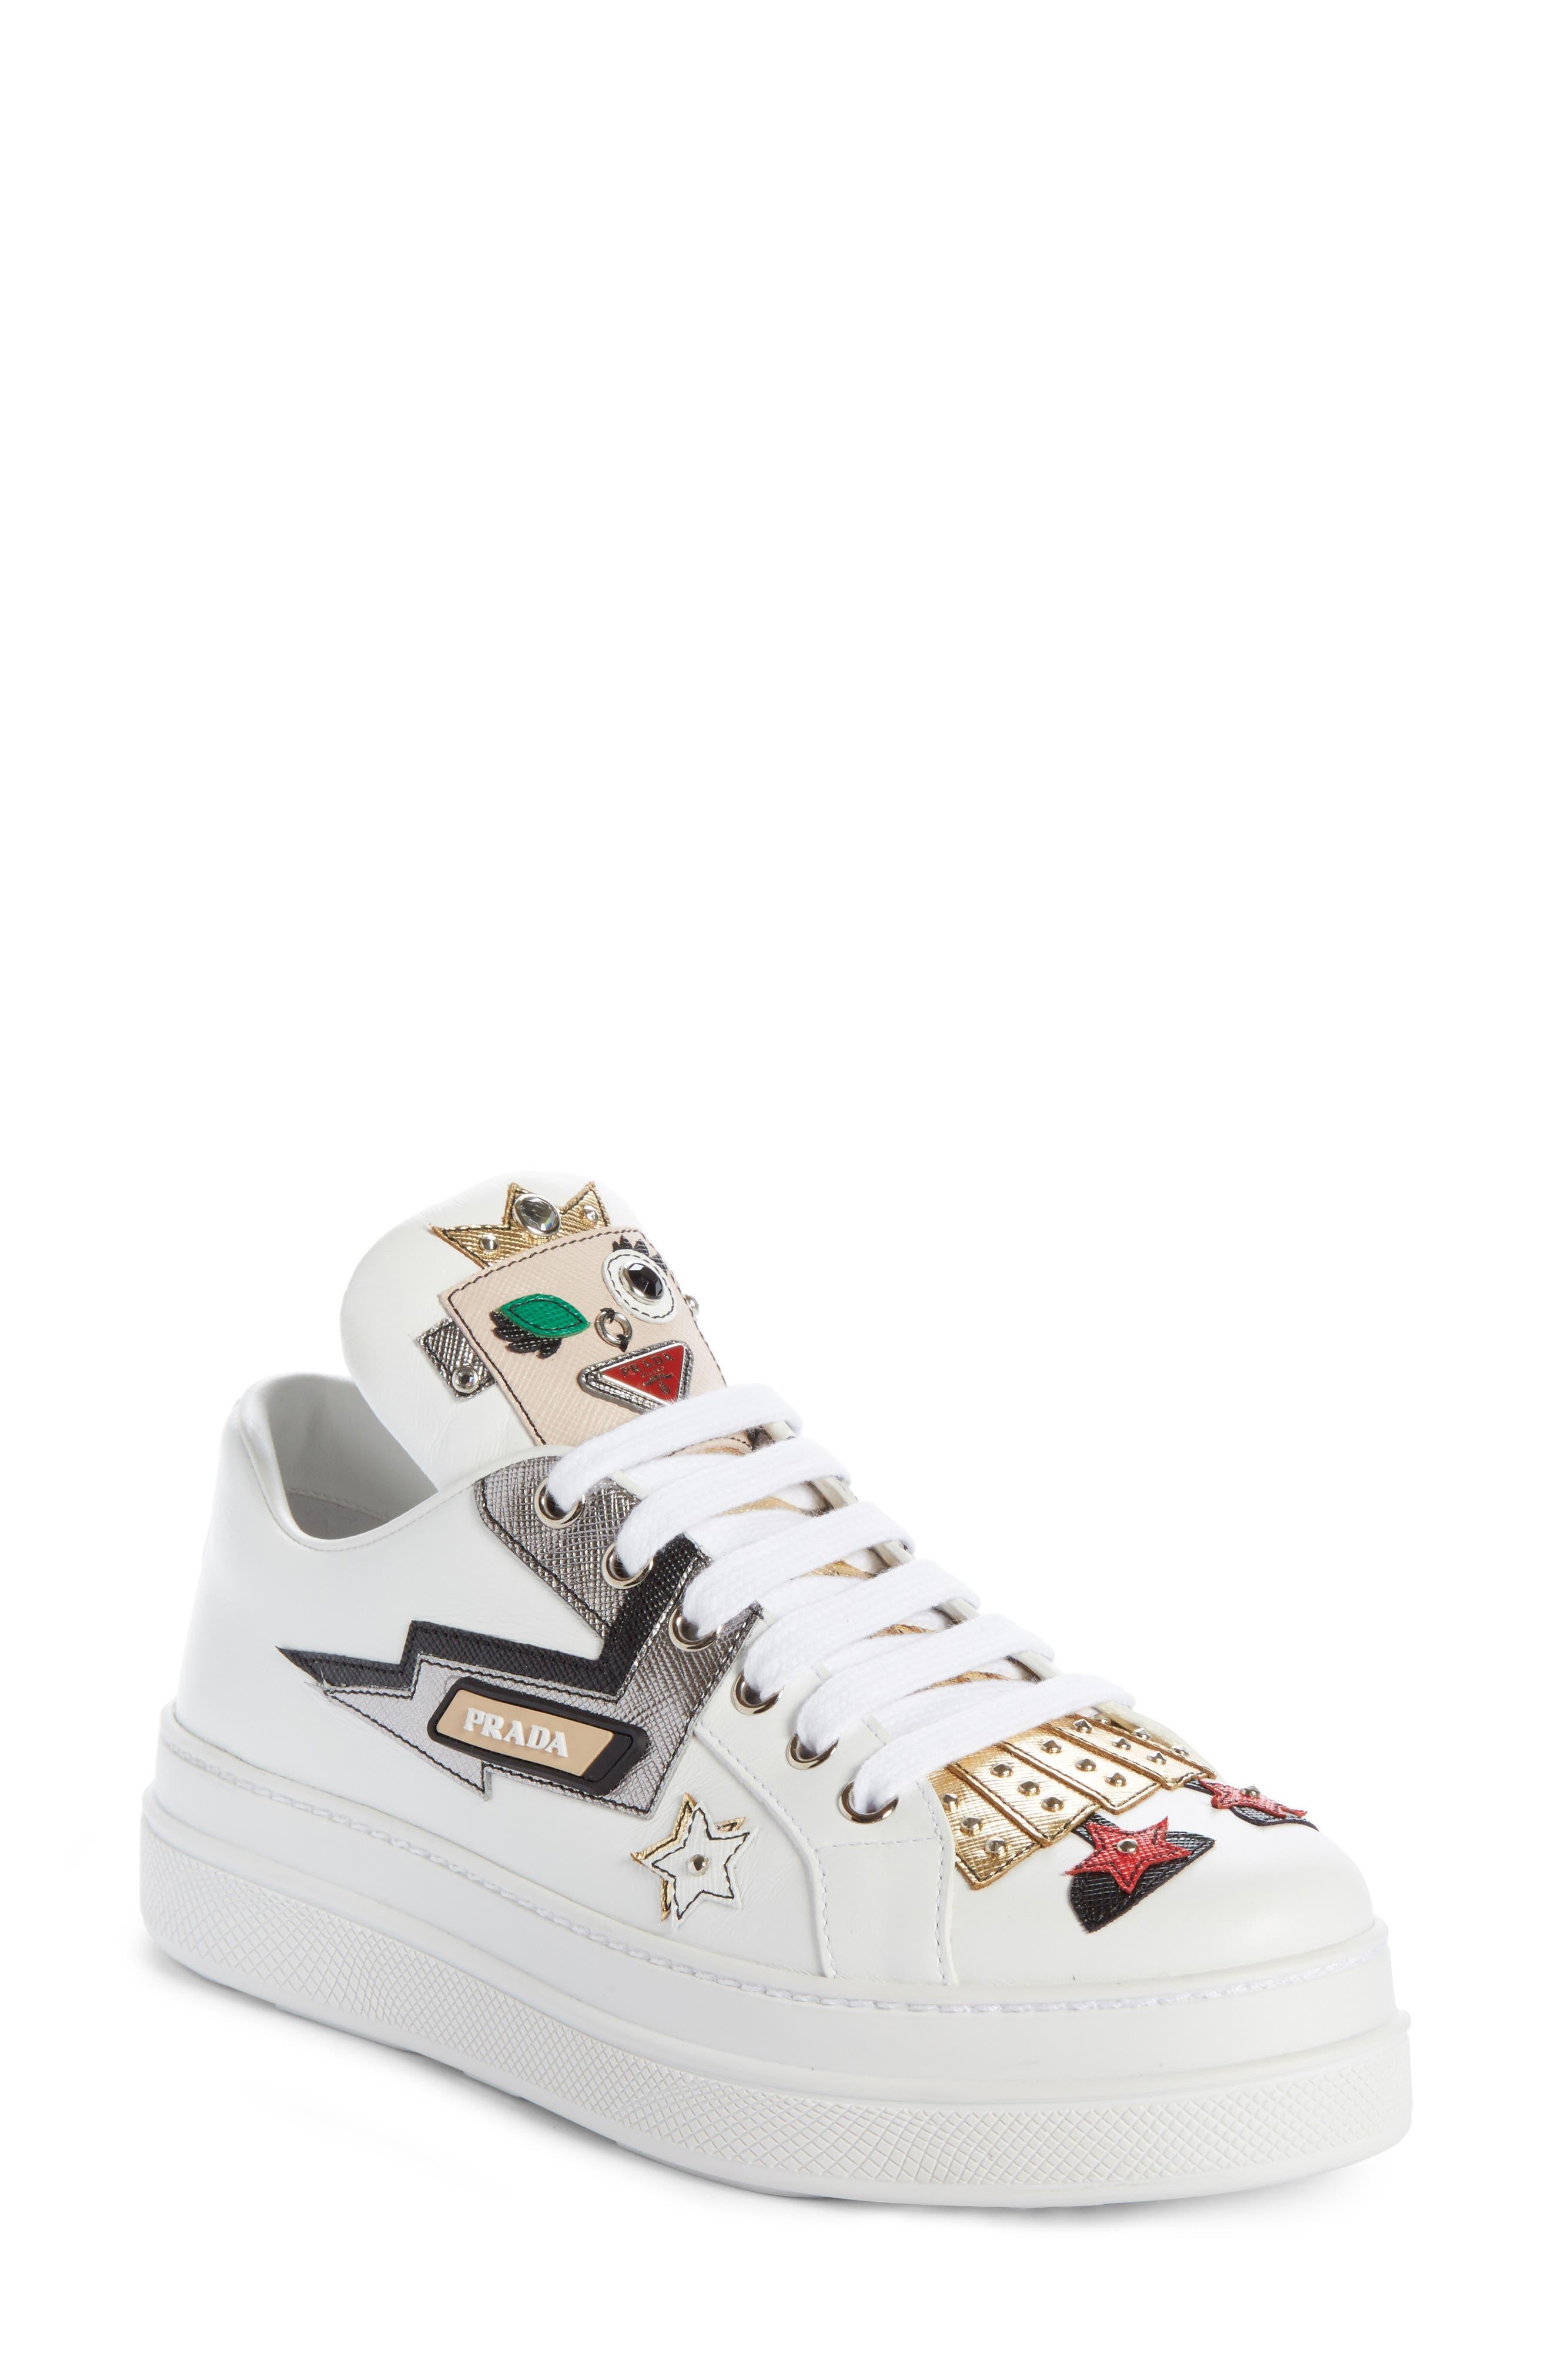 Prada Platforms Embellished Platform Sneaker